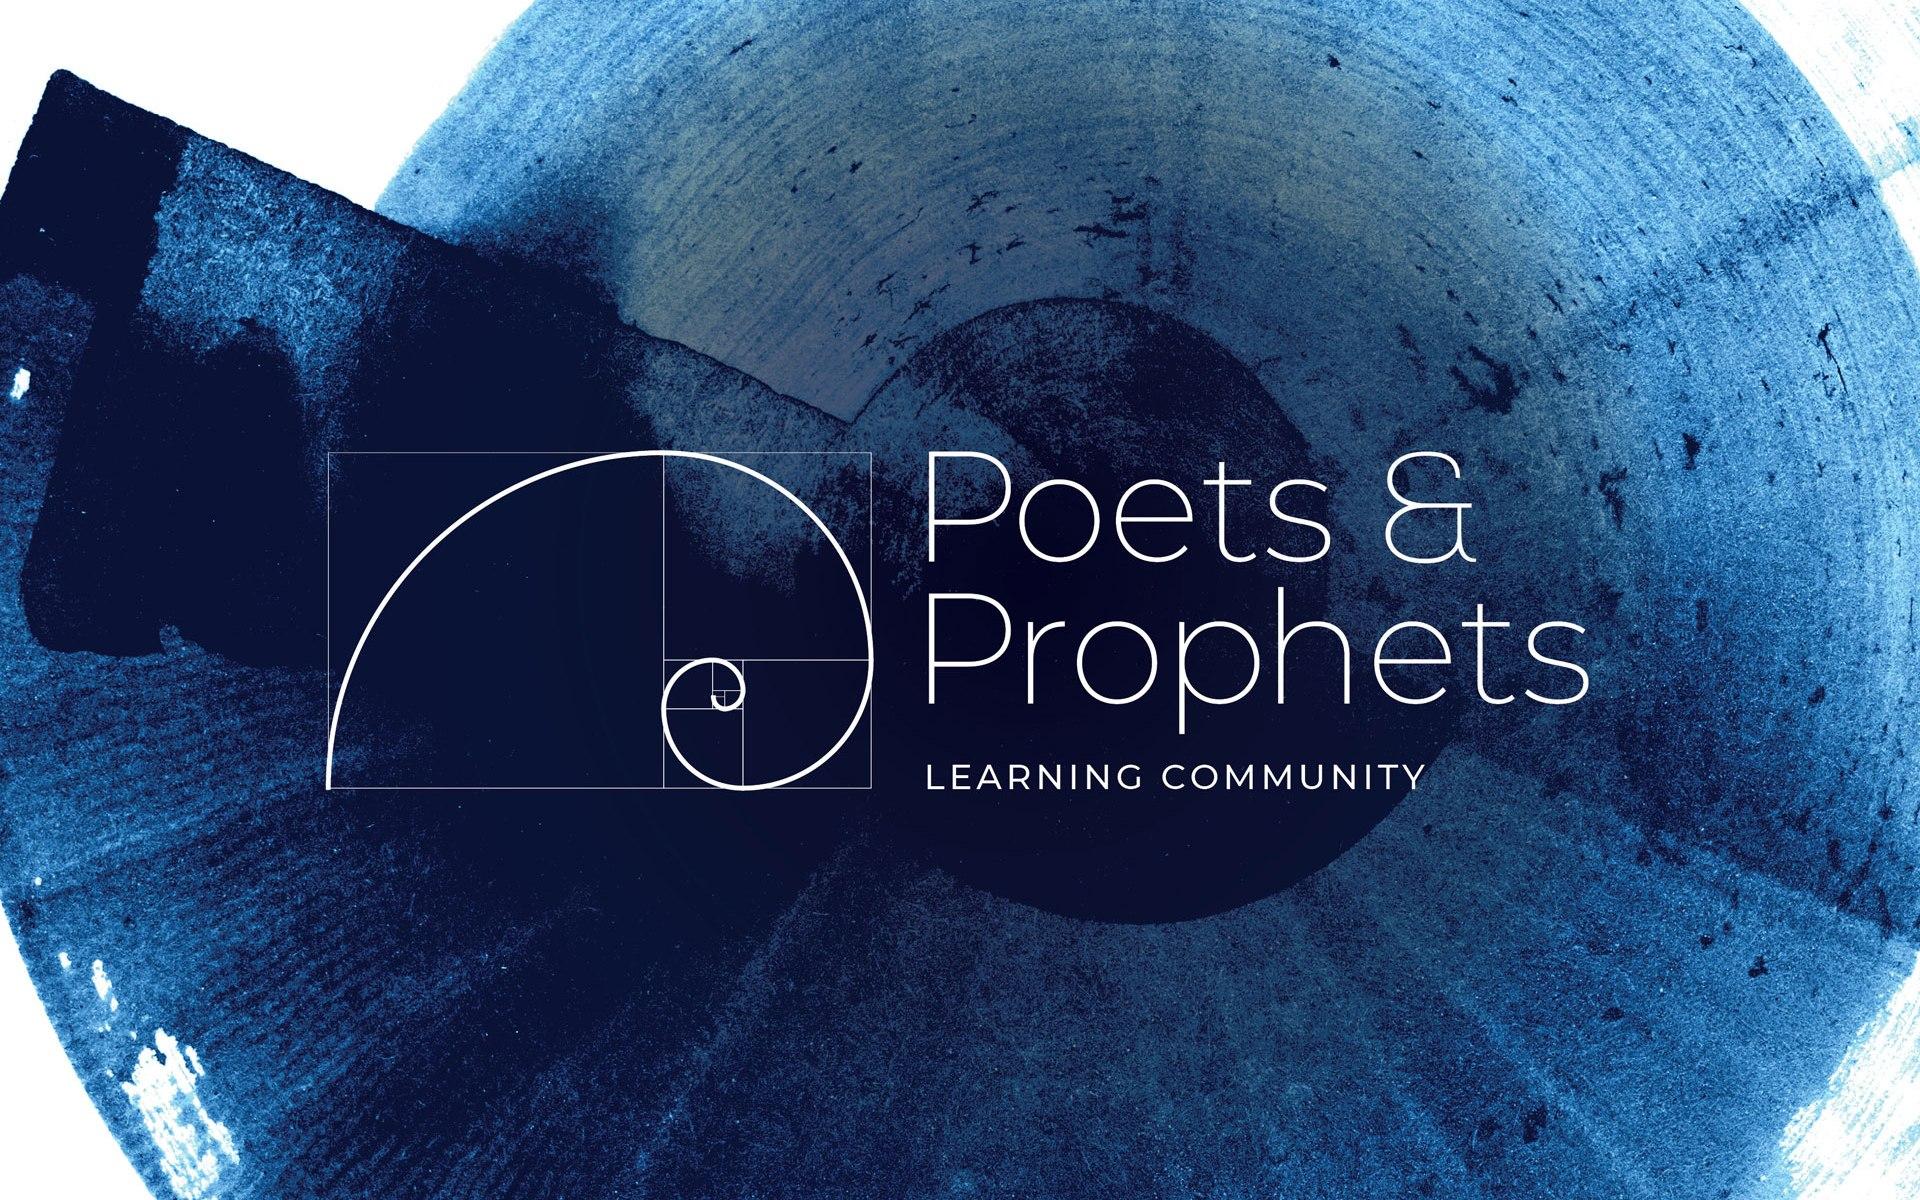 Poets&Prophets